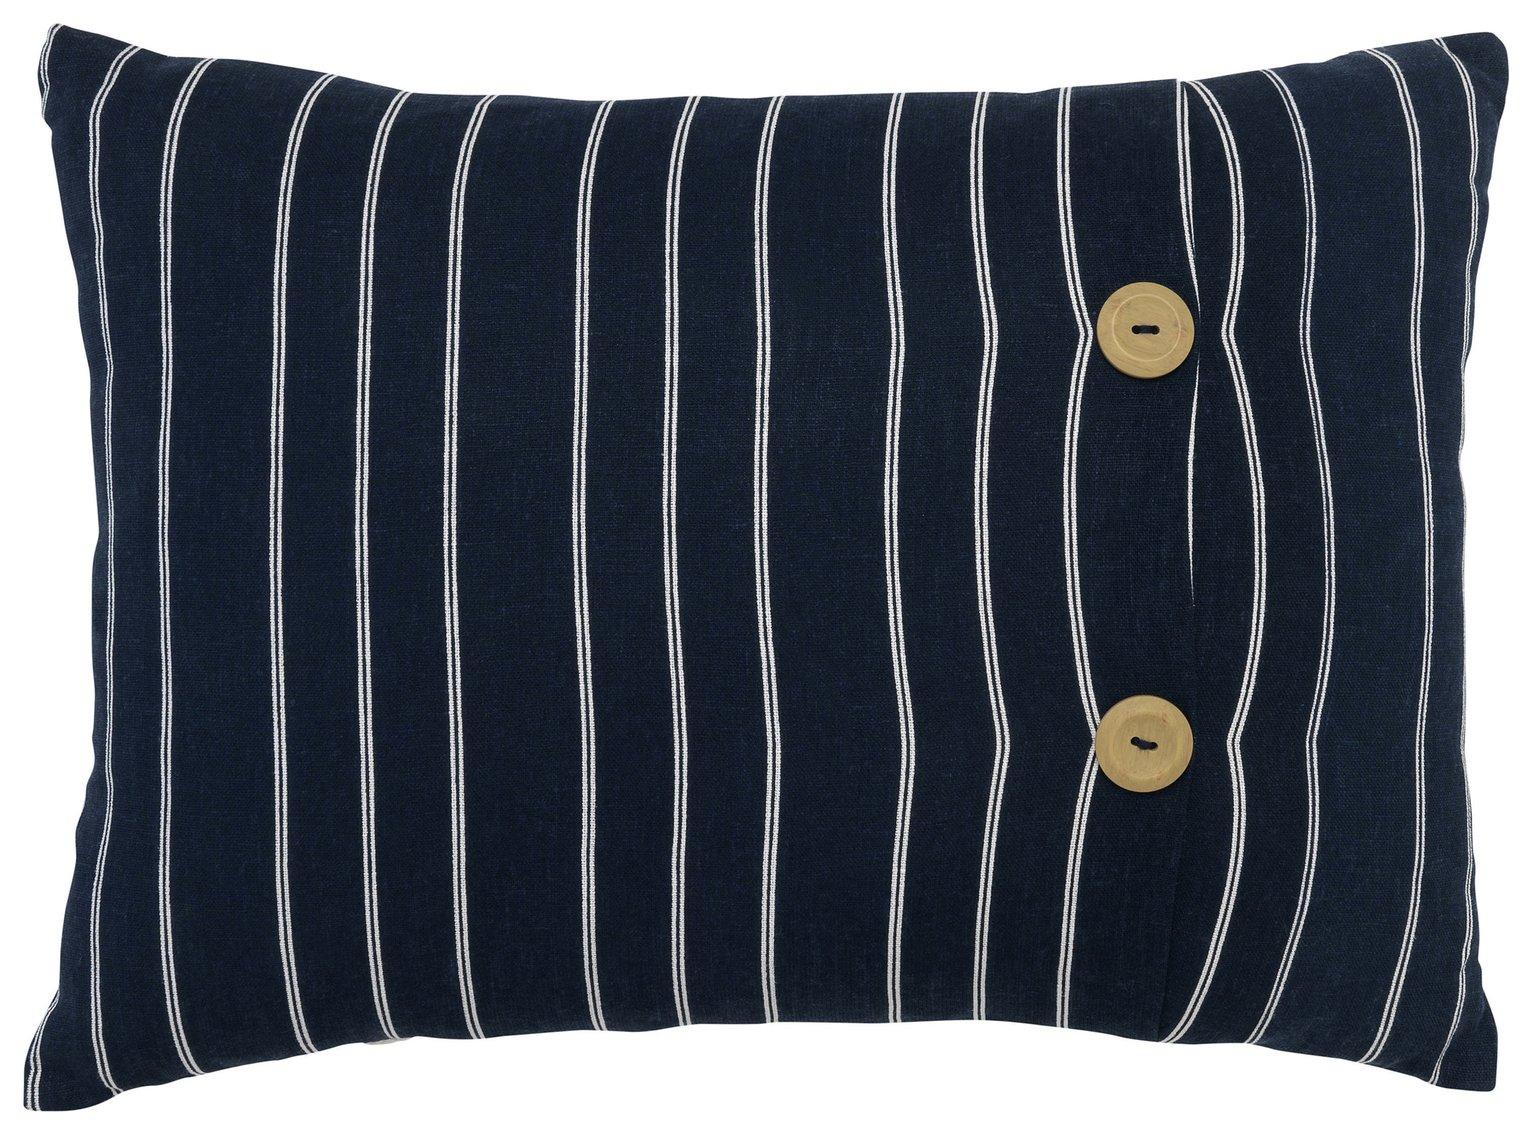 Sainsbury's Home Riviera Stripe Button Cushion - Navy